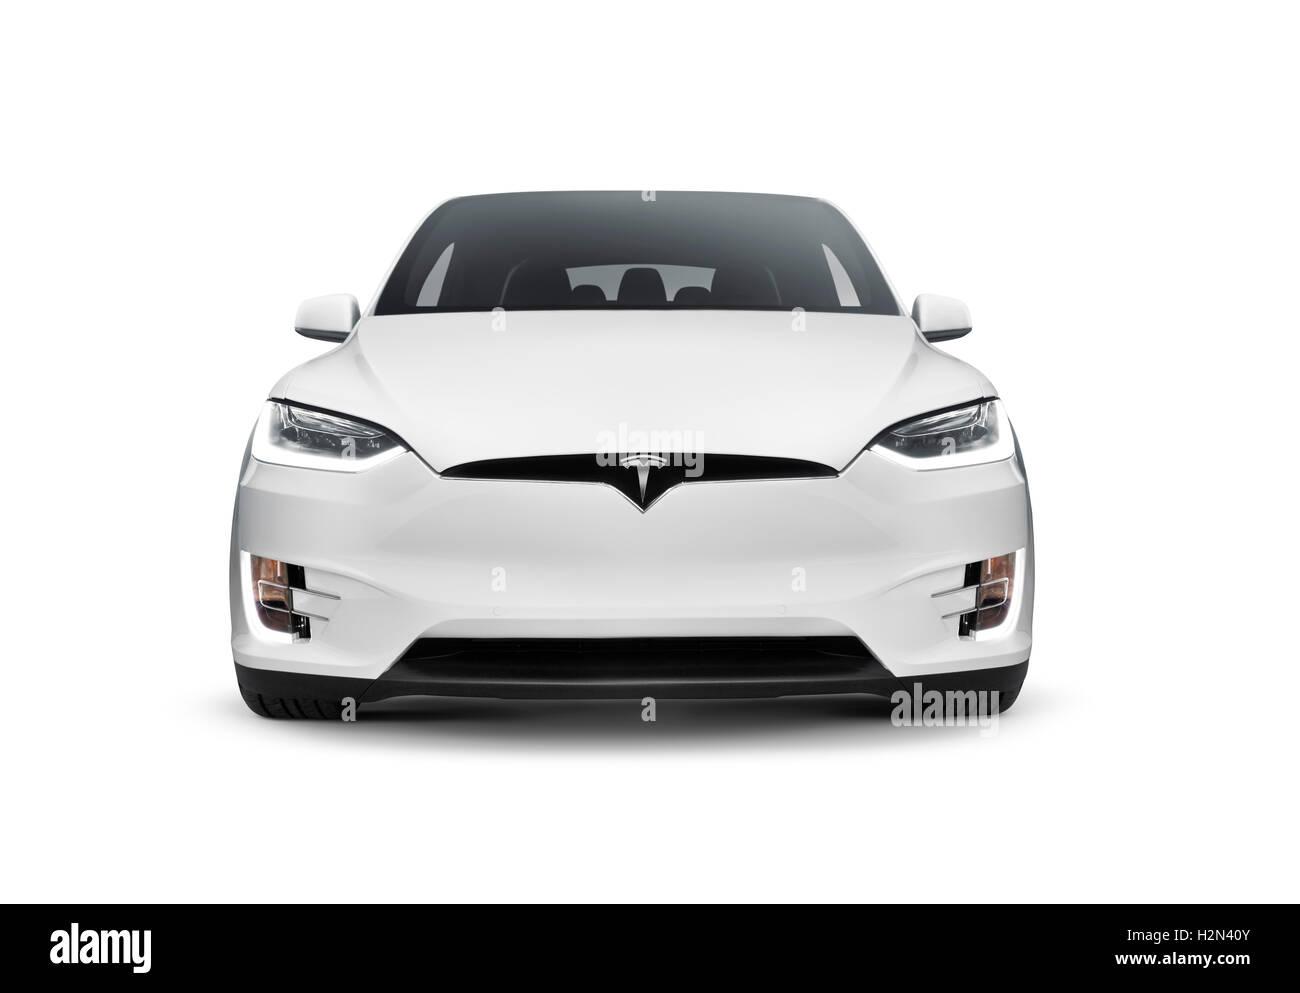 Electric Cars Cutout